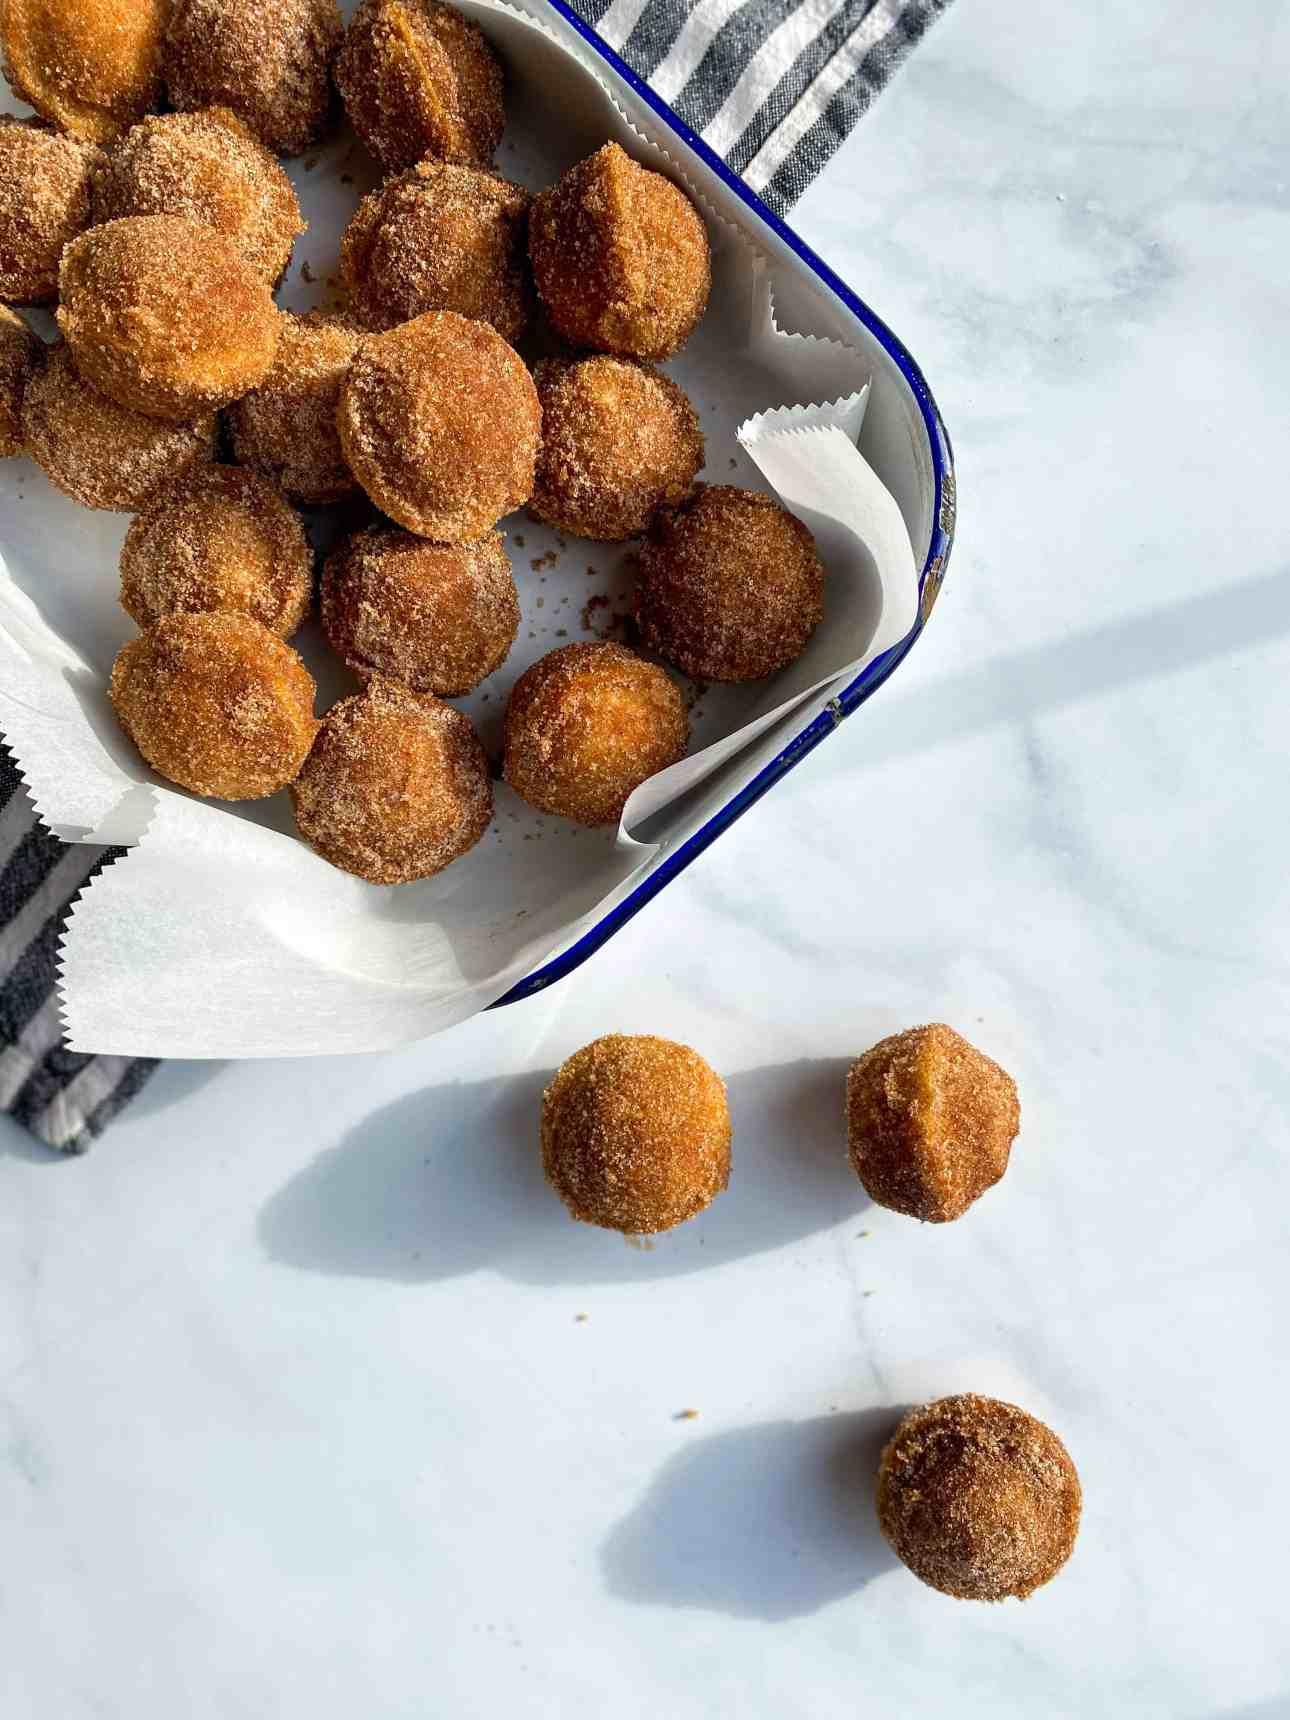 Cinnamon-Cardamom Mini Donut Muffins